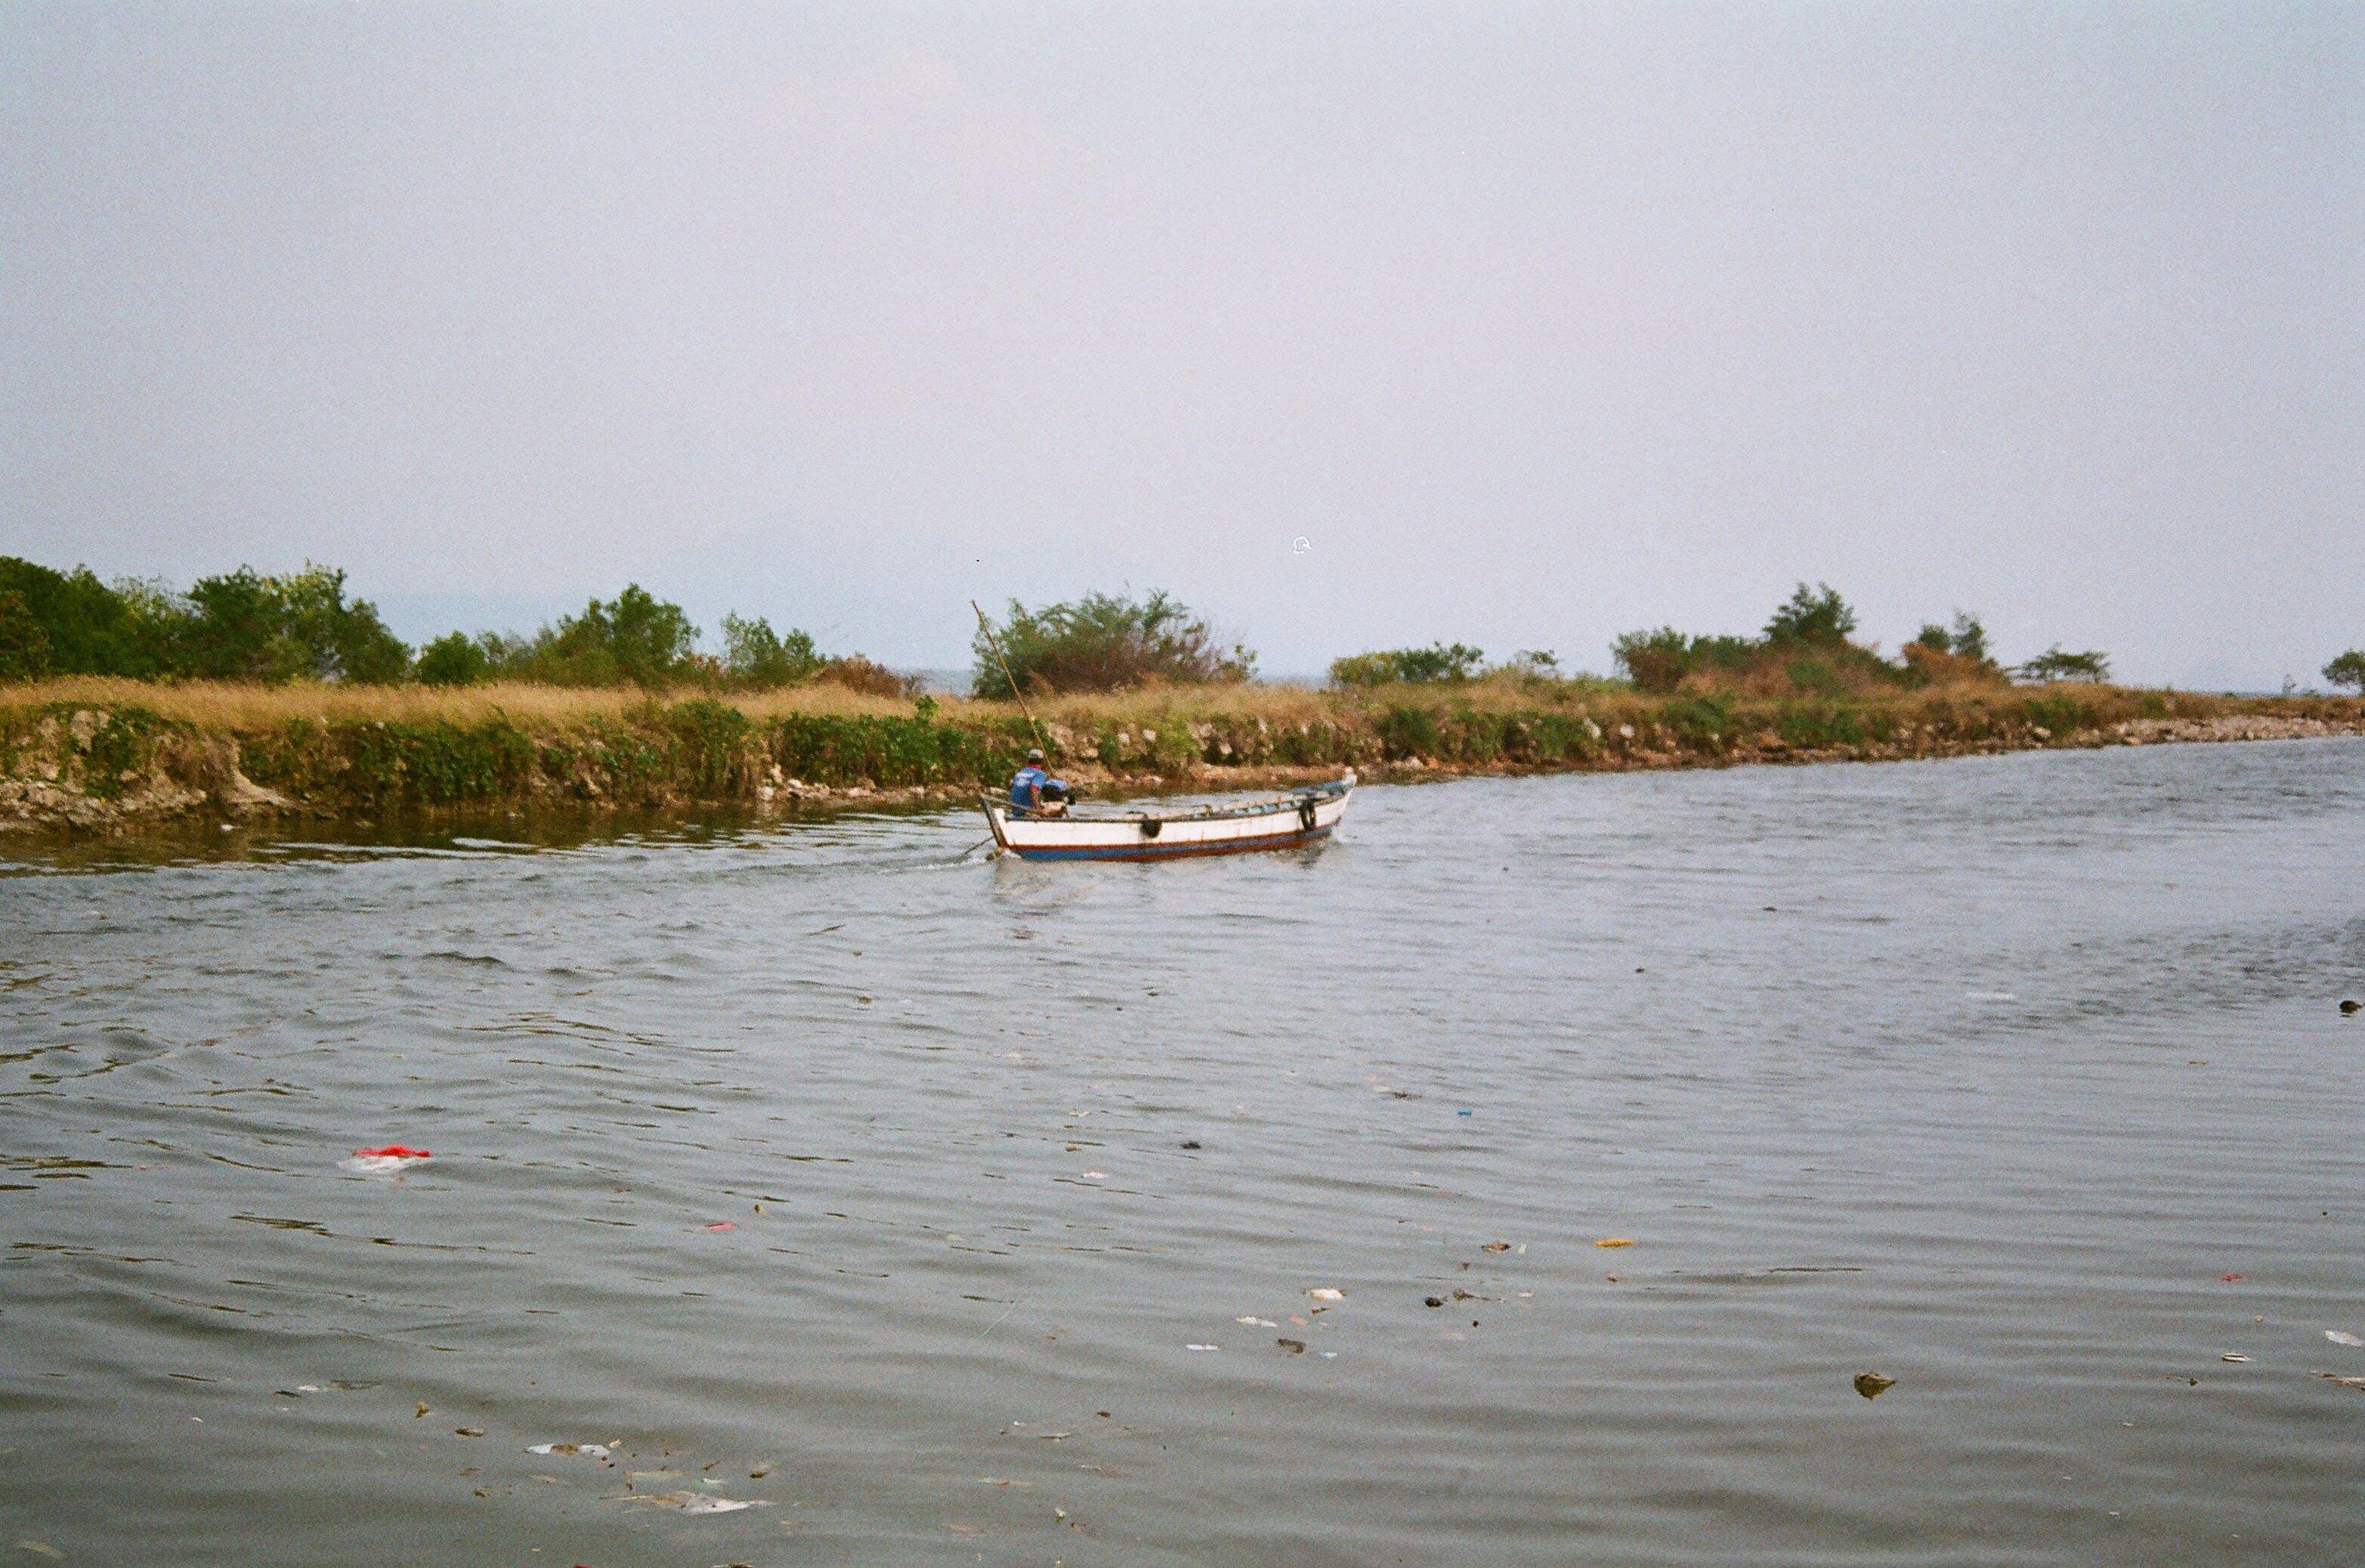 of boat, river, simple, single boat